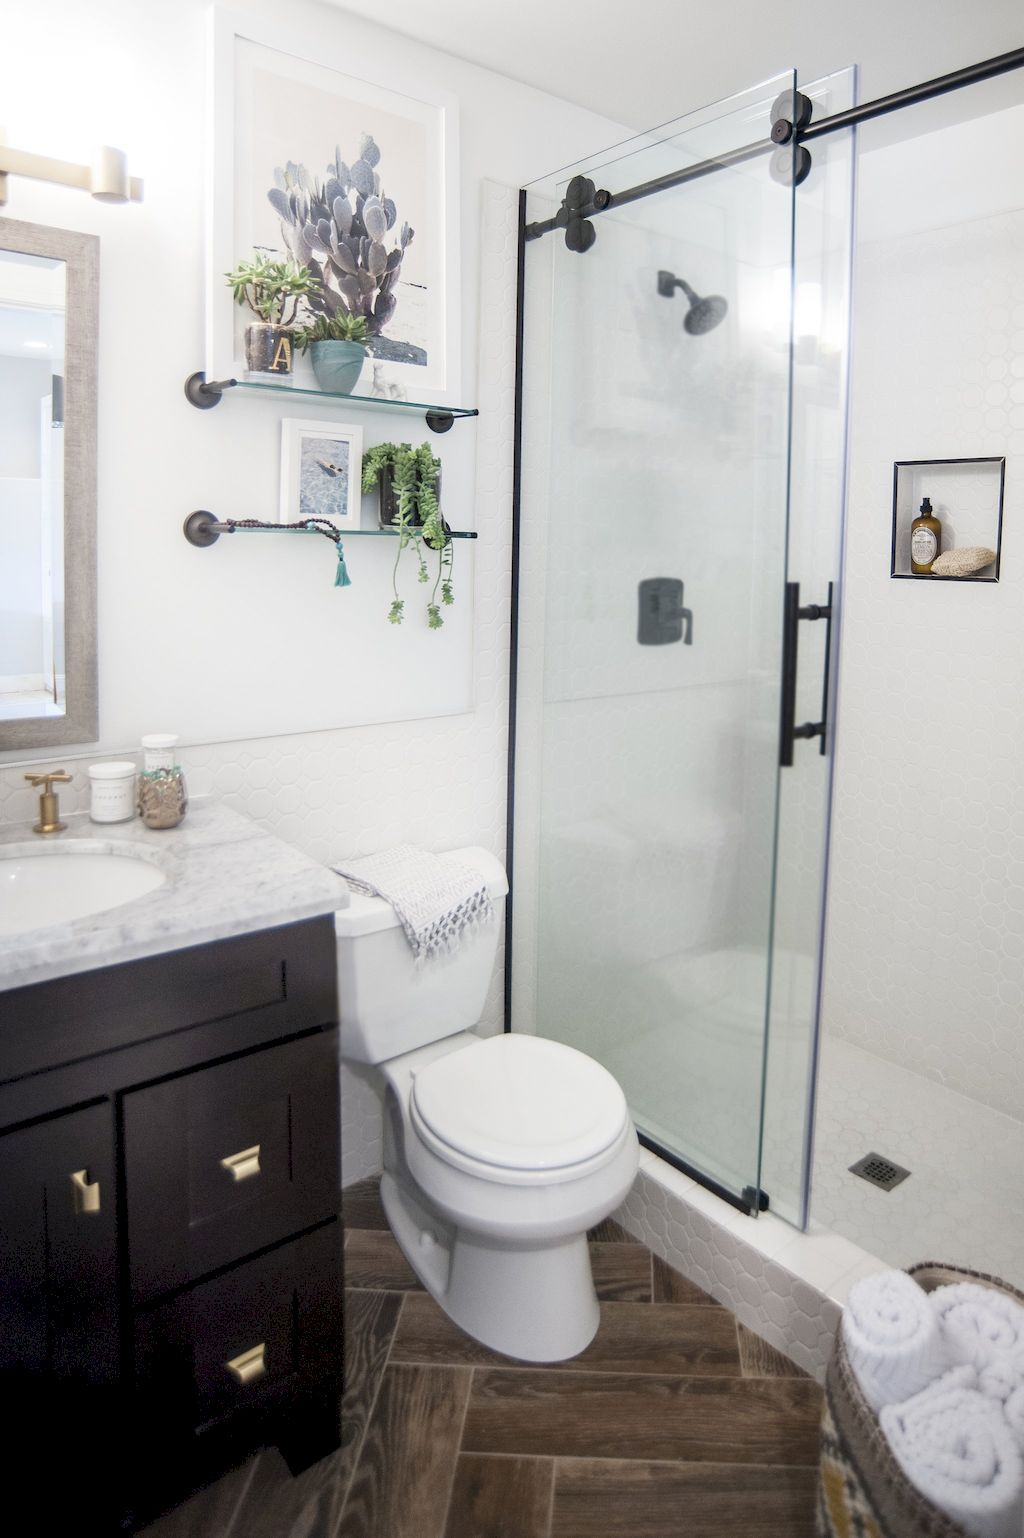 50 Awesome Master Bathroom Remodel Ideas | Master bathroom remodel ...